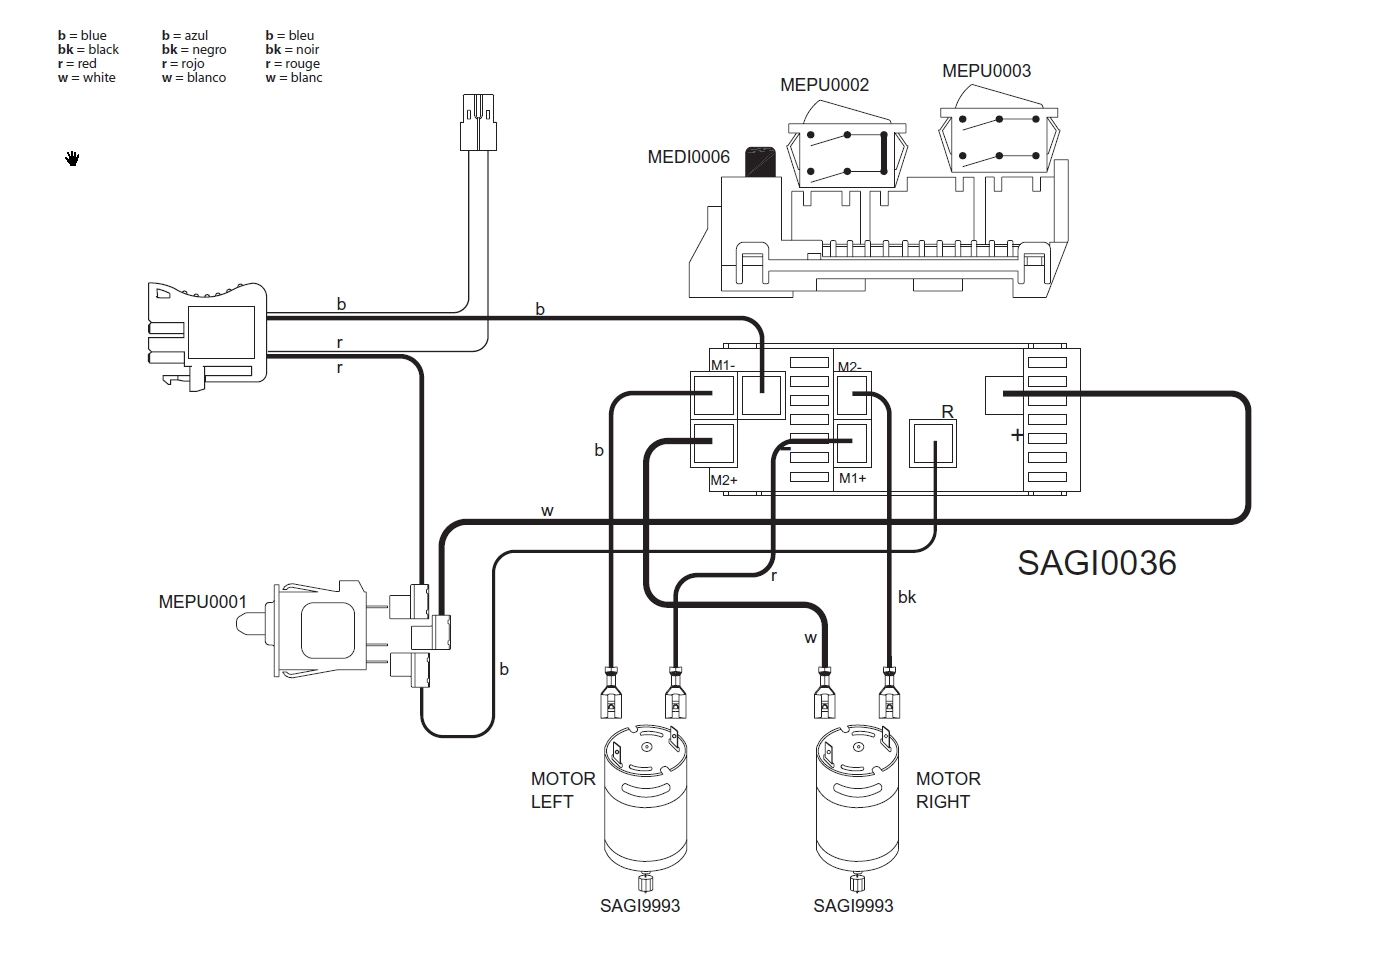 John Deere 400 Wiring Diagram